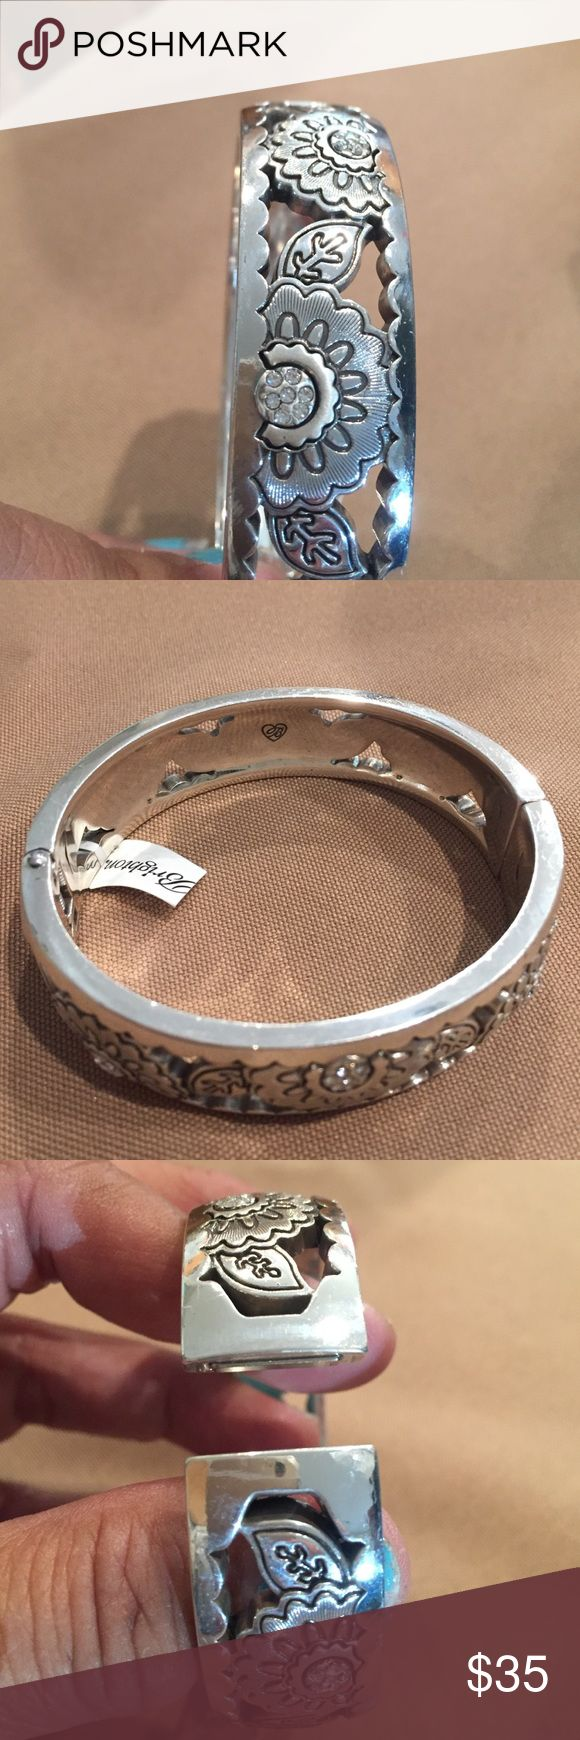 Brand new Brighton bracelet Brand new with tag, never worn bracelet Brighton Jewelry Bracelets